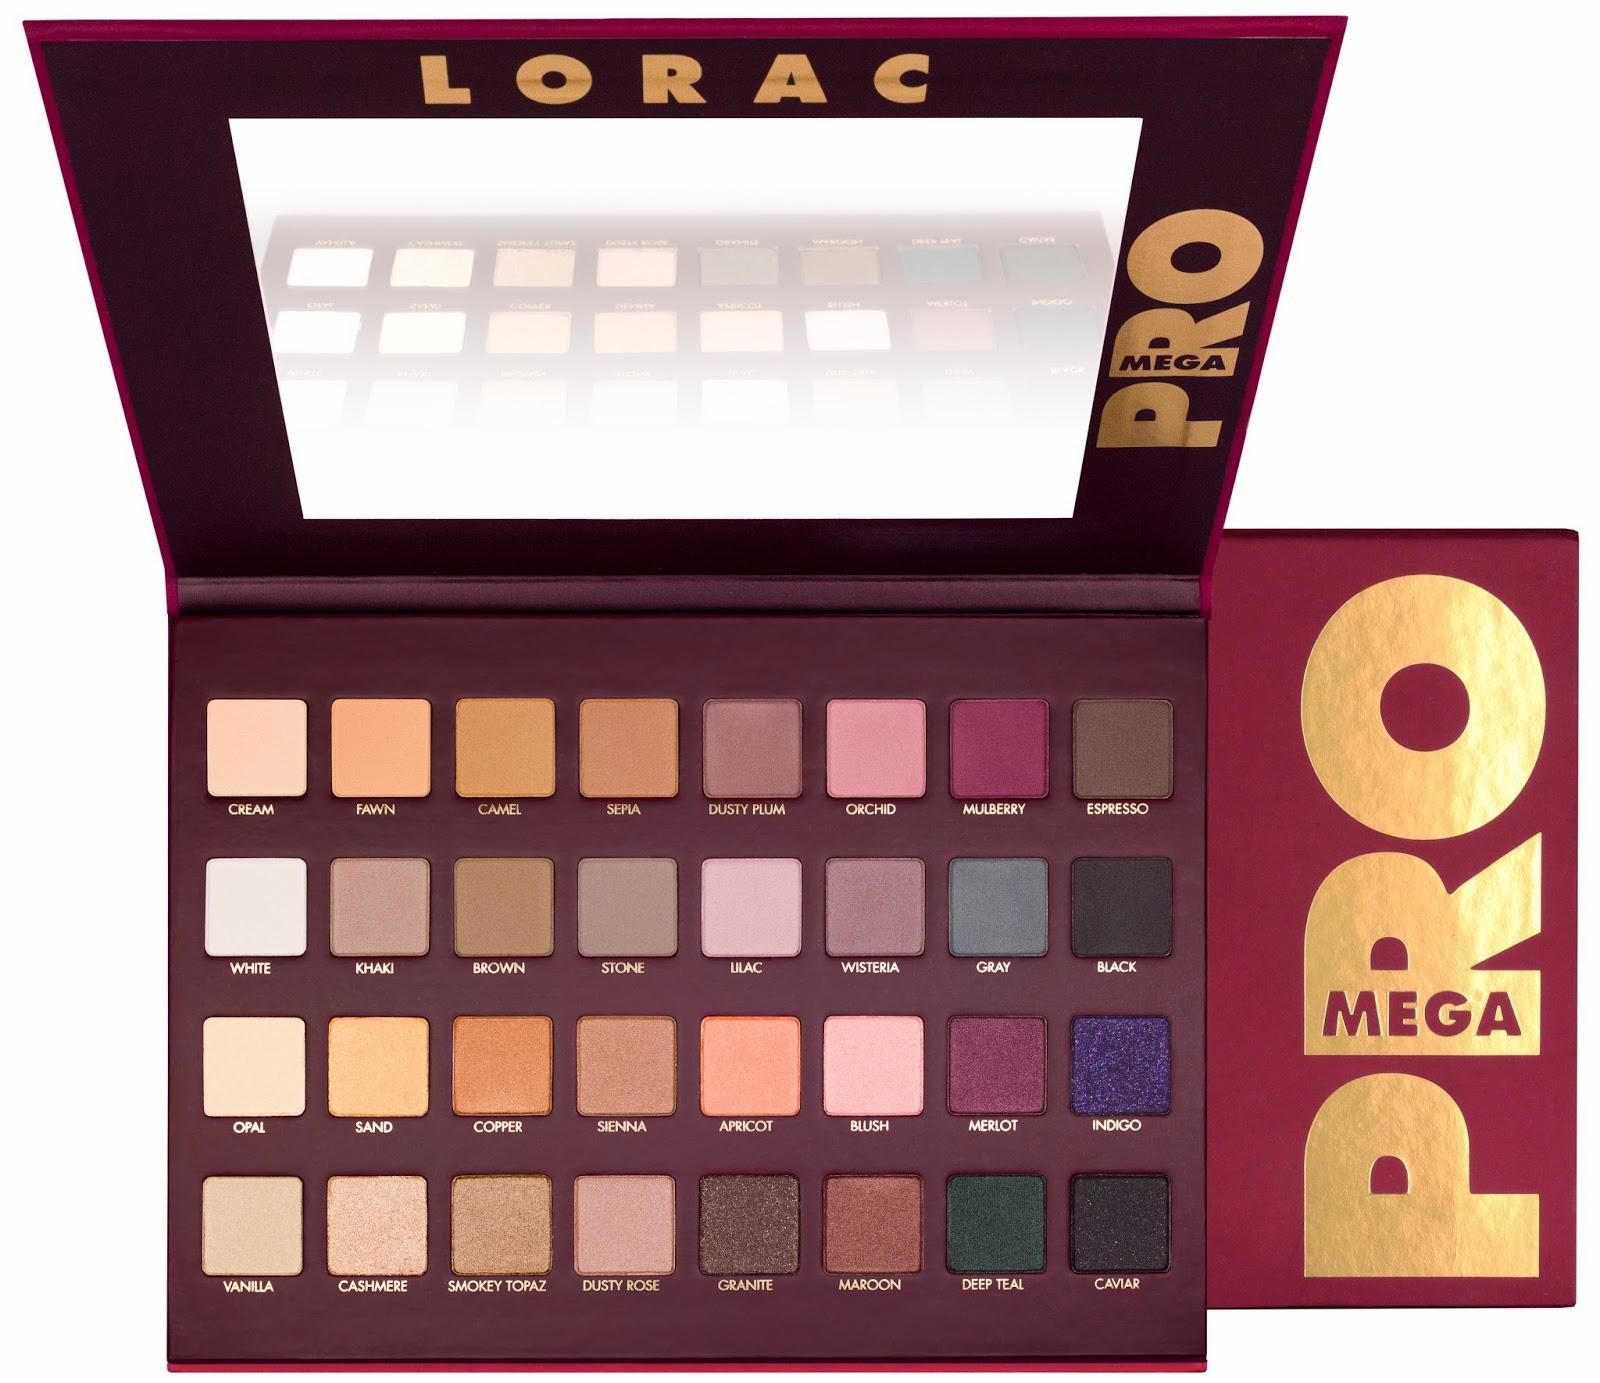 bo s blog purchasing amazon com lorac mega pro makeup palette